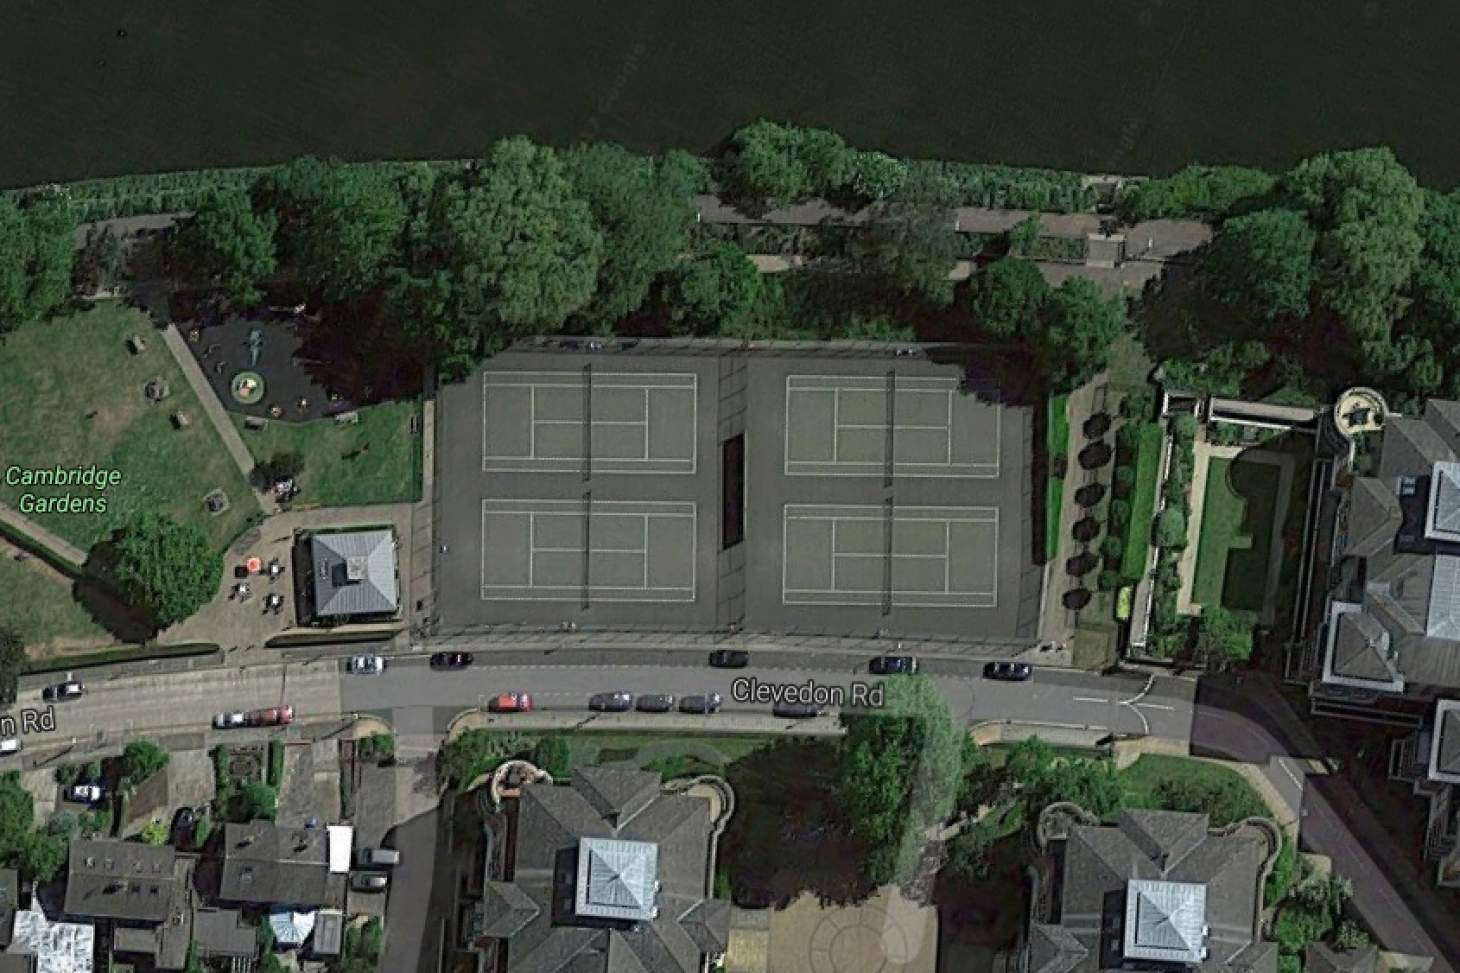 Cambridge Gardens Outdoor | Hard (macadam) tennis court